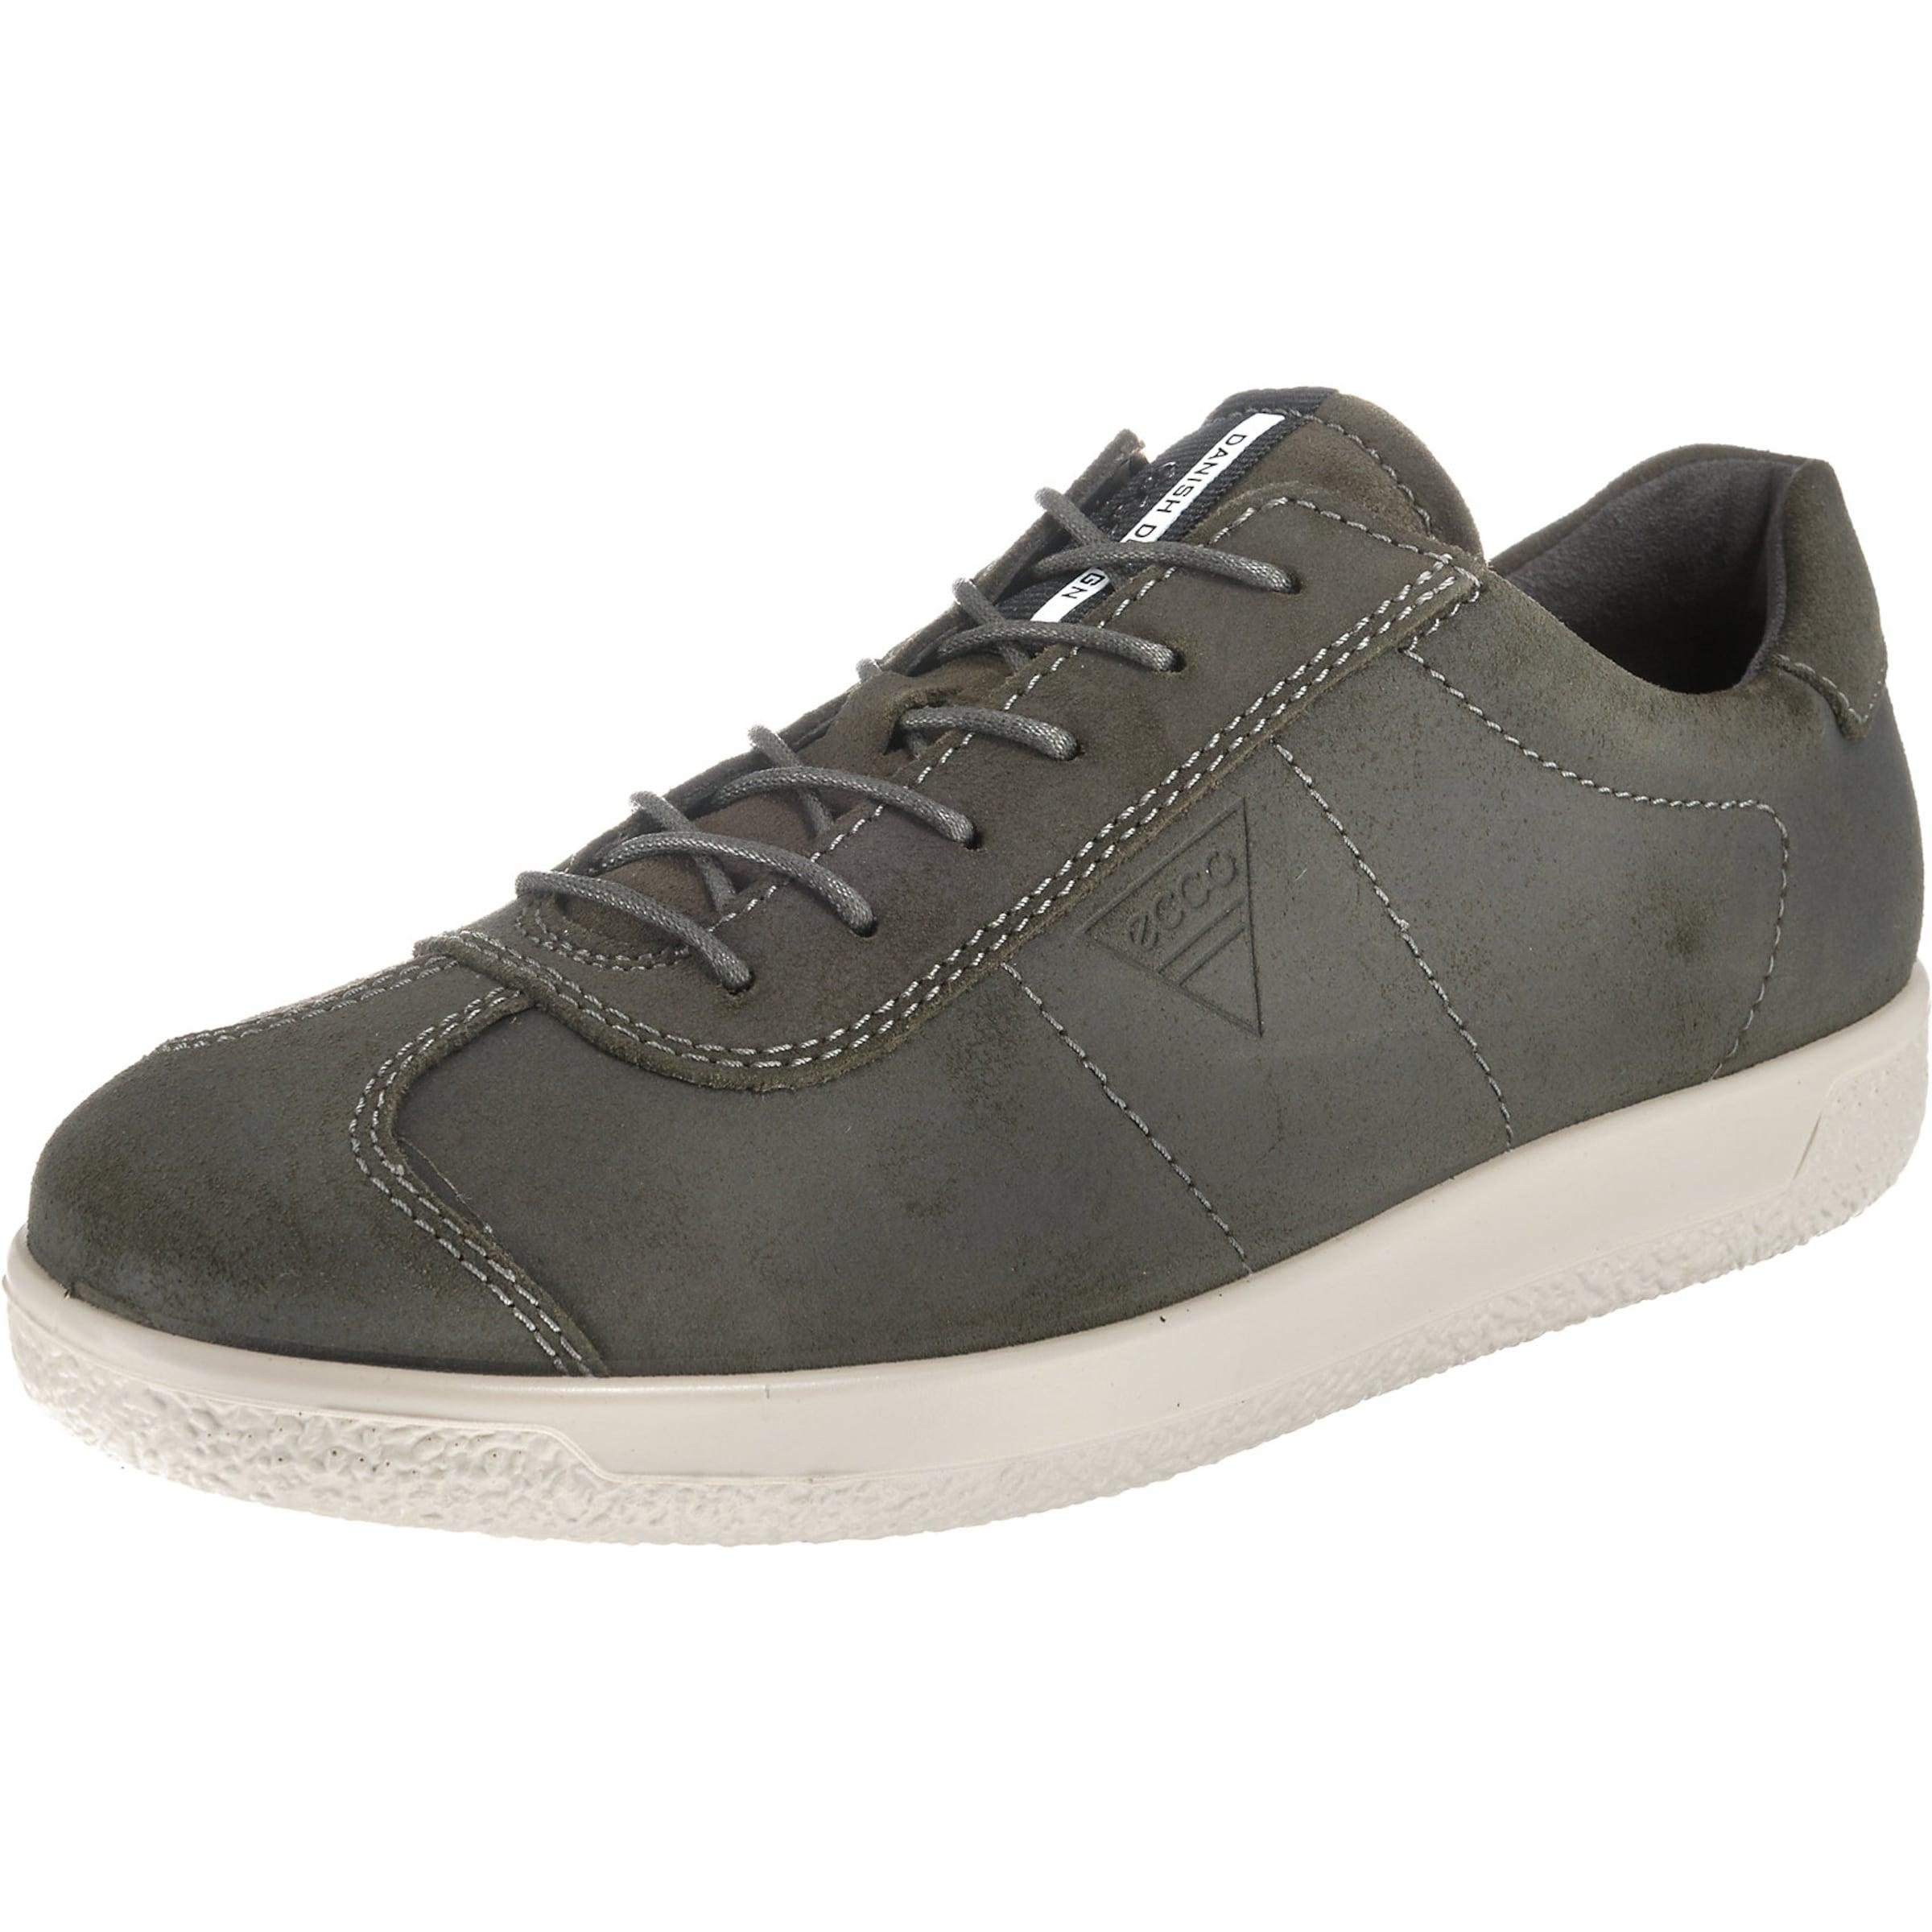 ECCO Sneakers Low  Suede